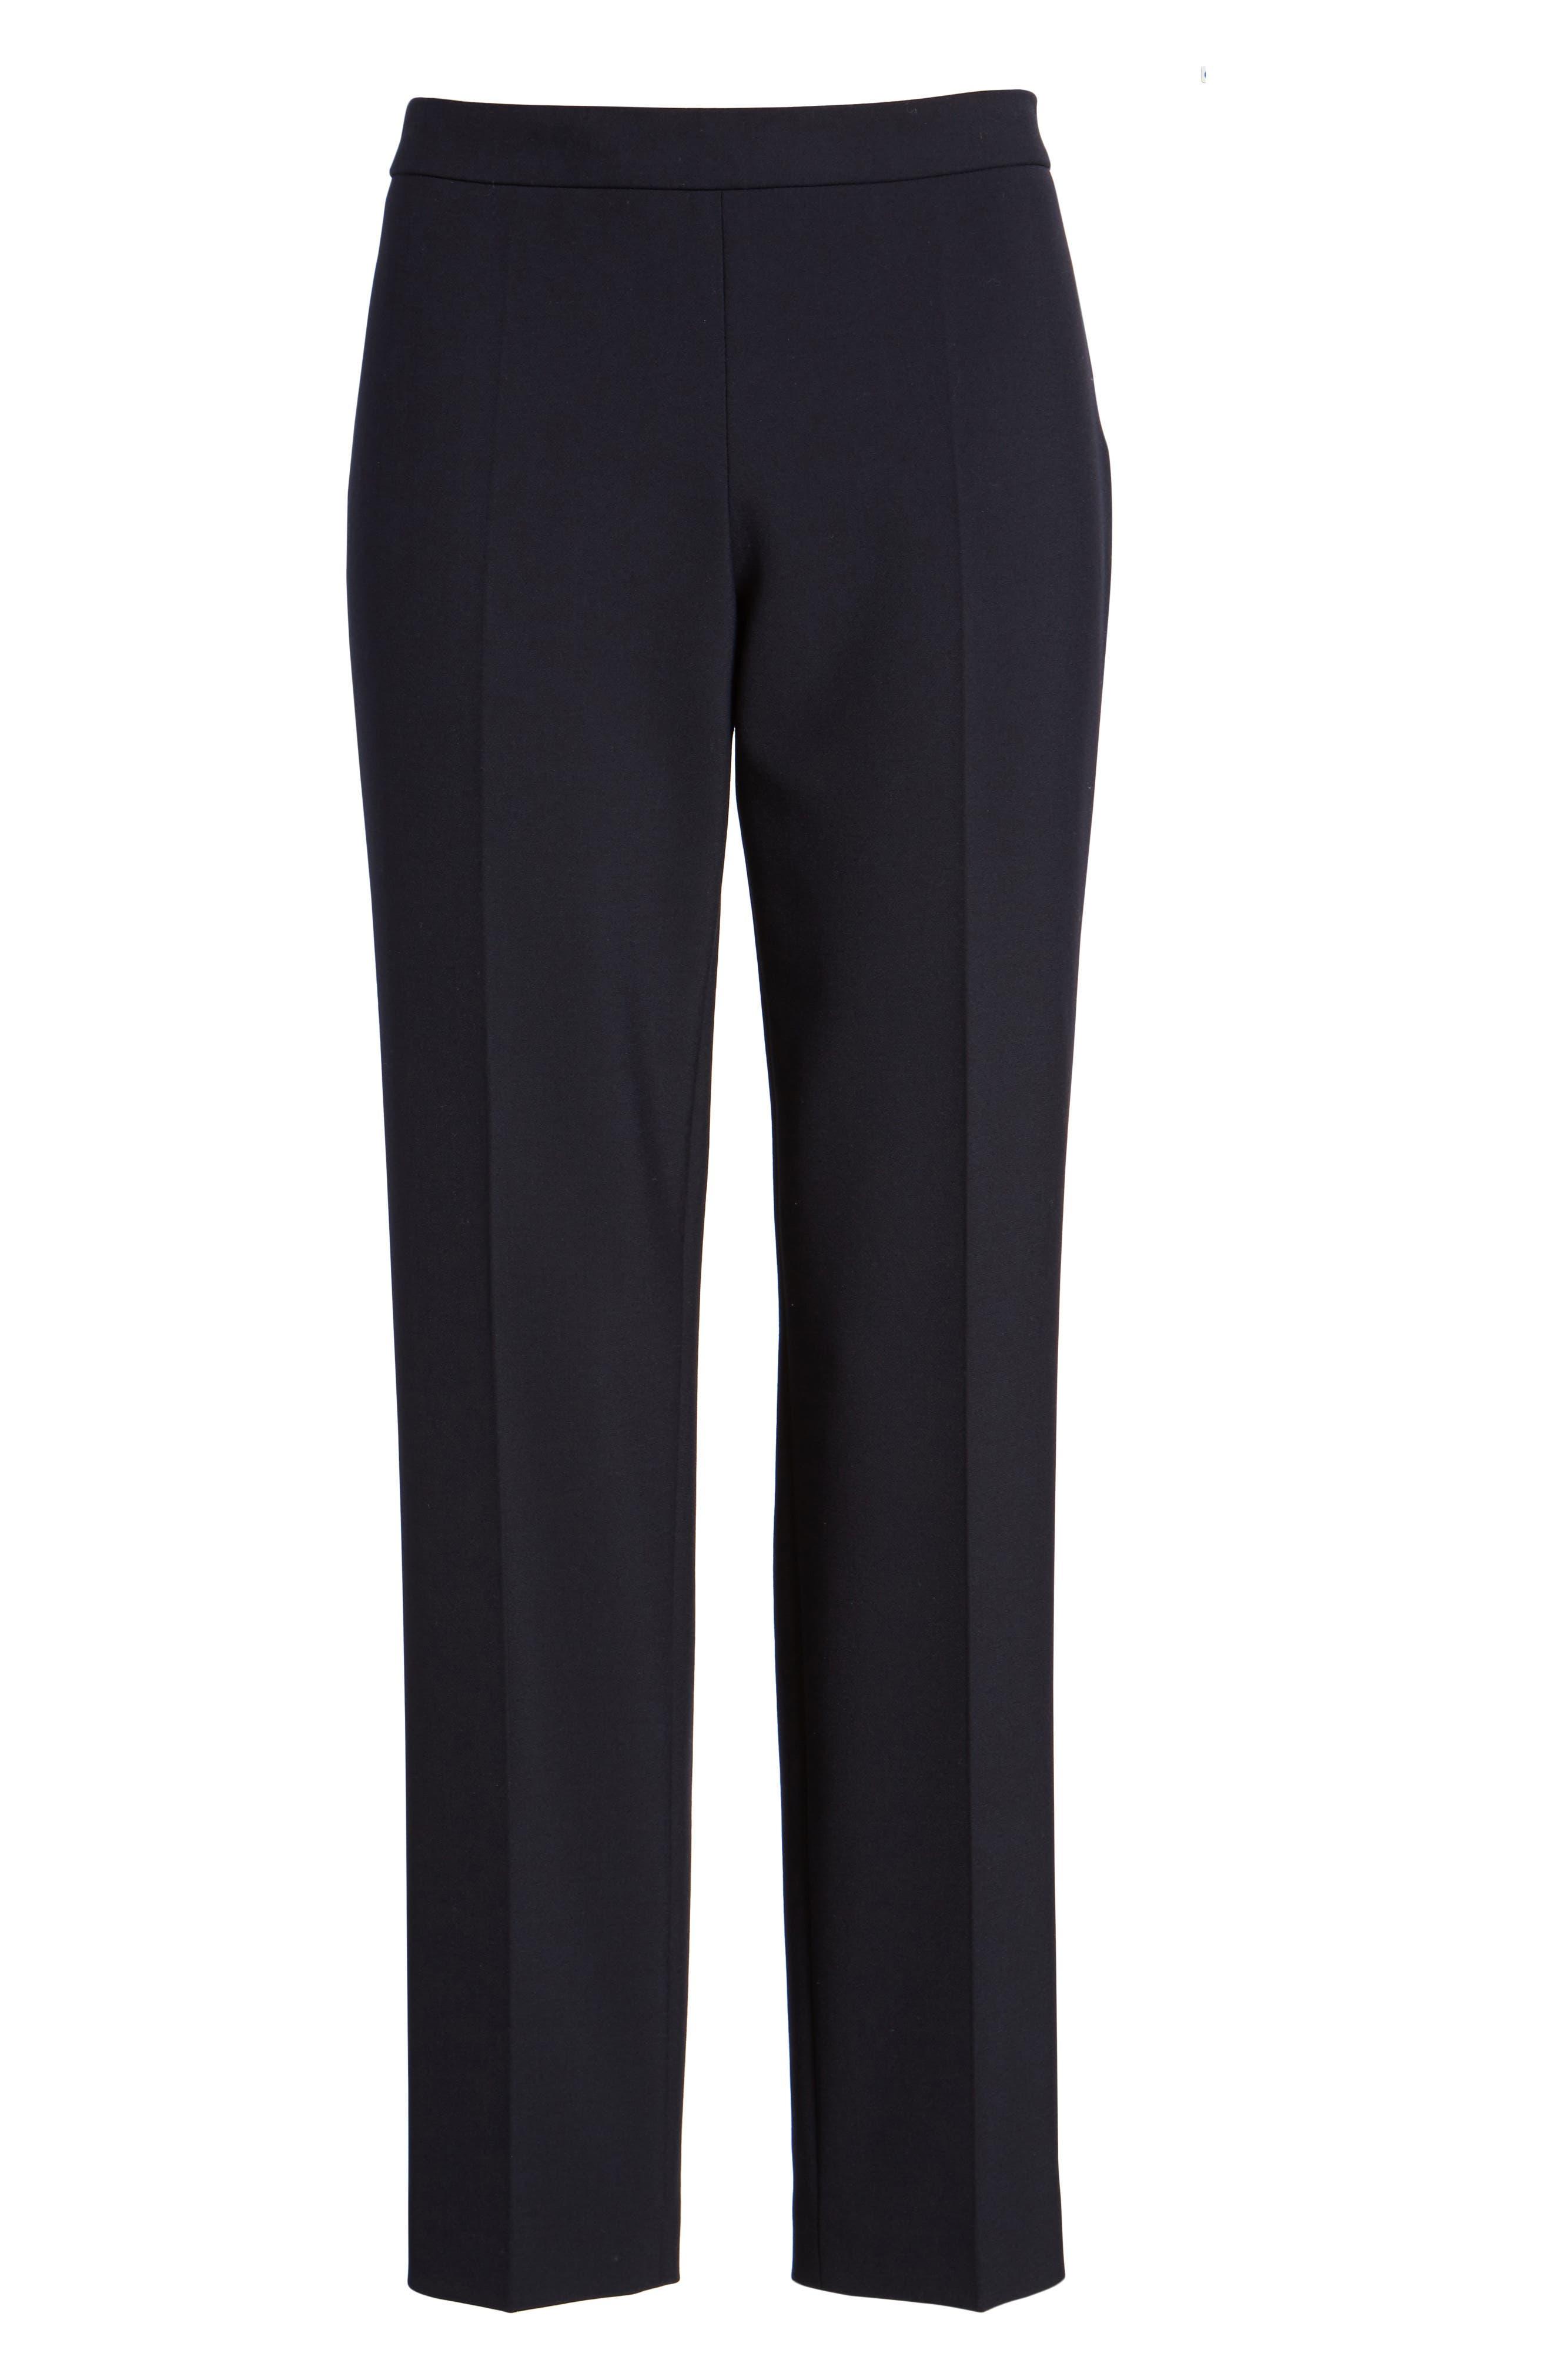 Tiluna Side Zip Ponte Trousers,                             Alternate thumbnail 6, color,                             Navy